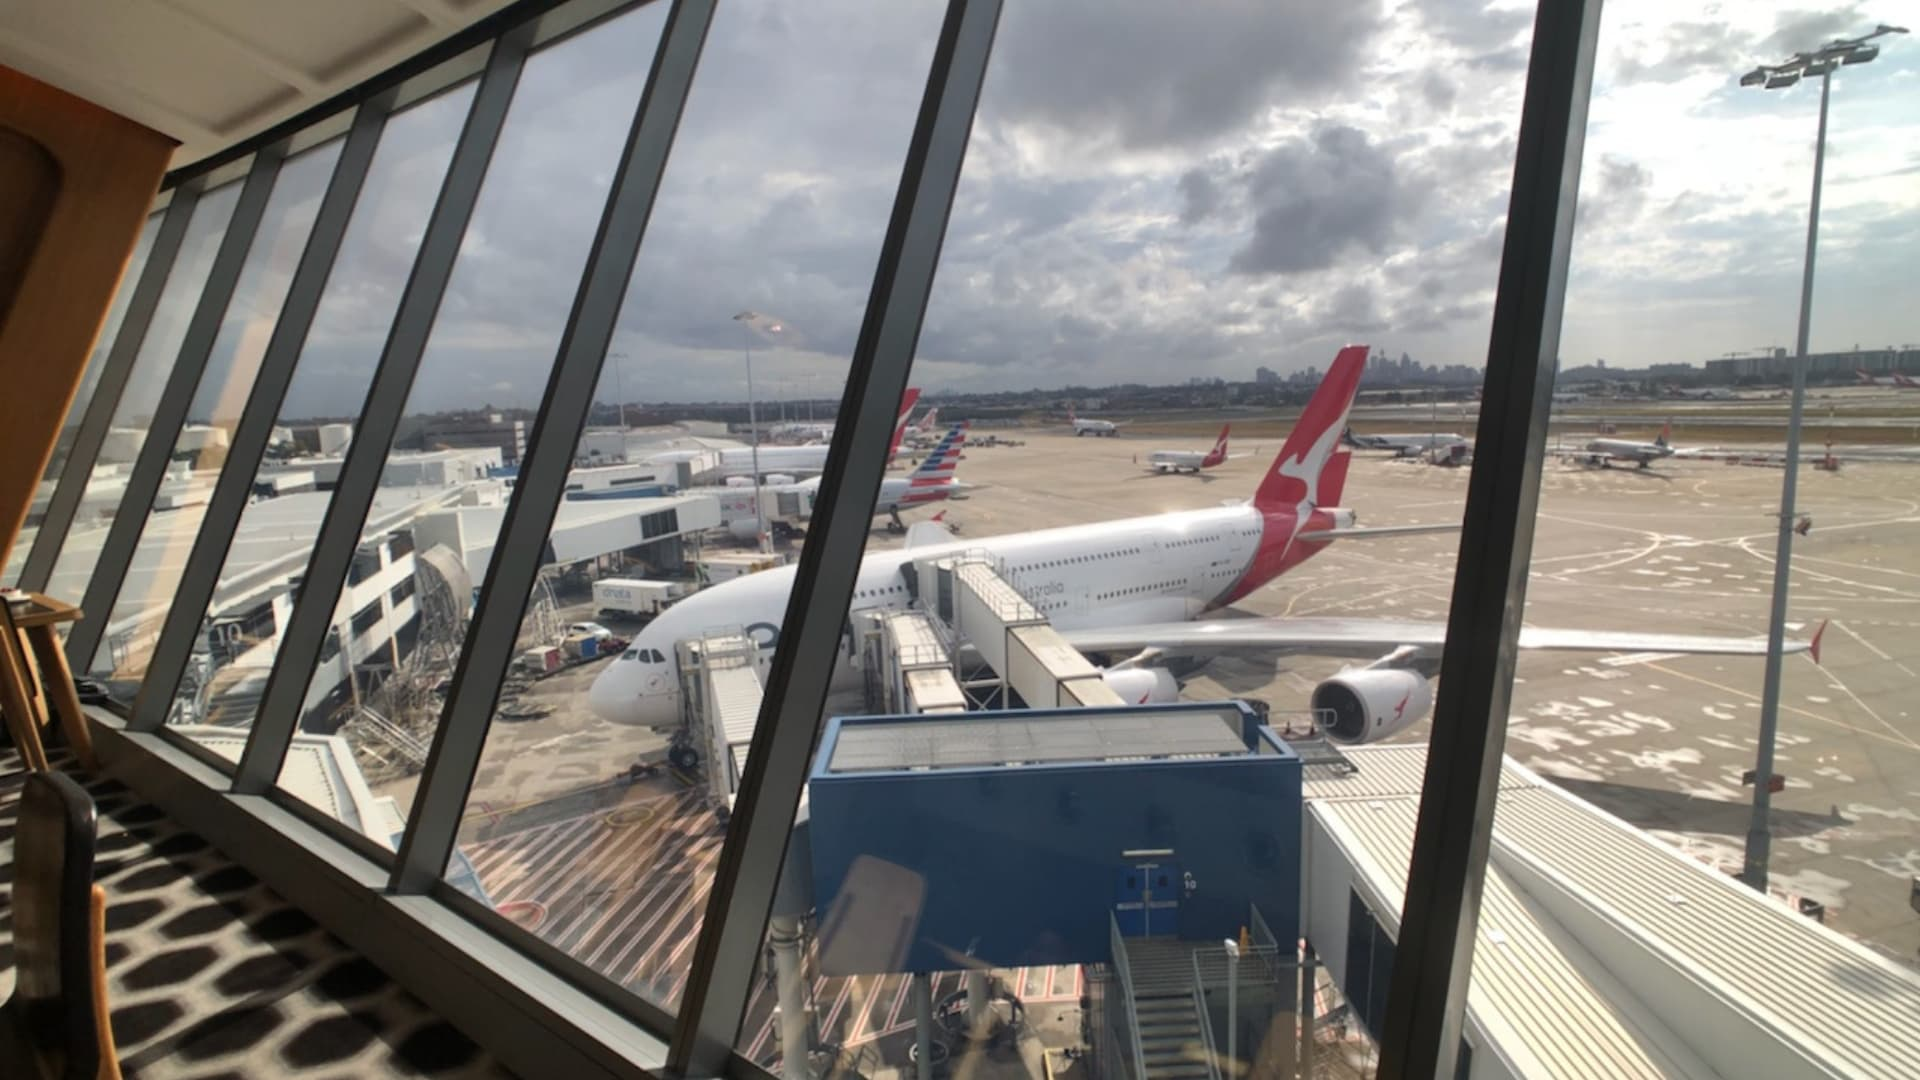 qantas first class lounge view